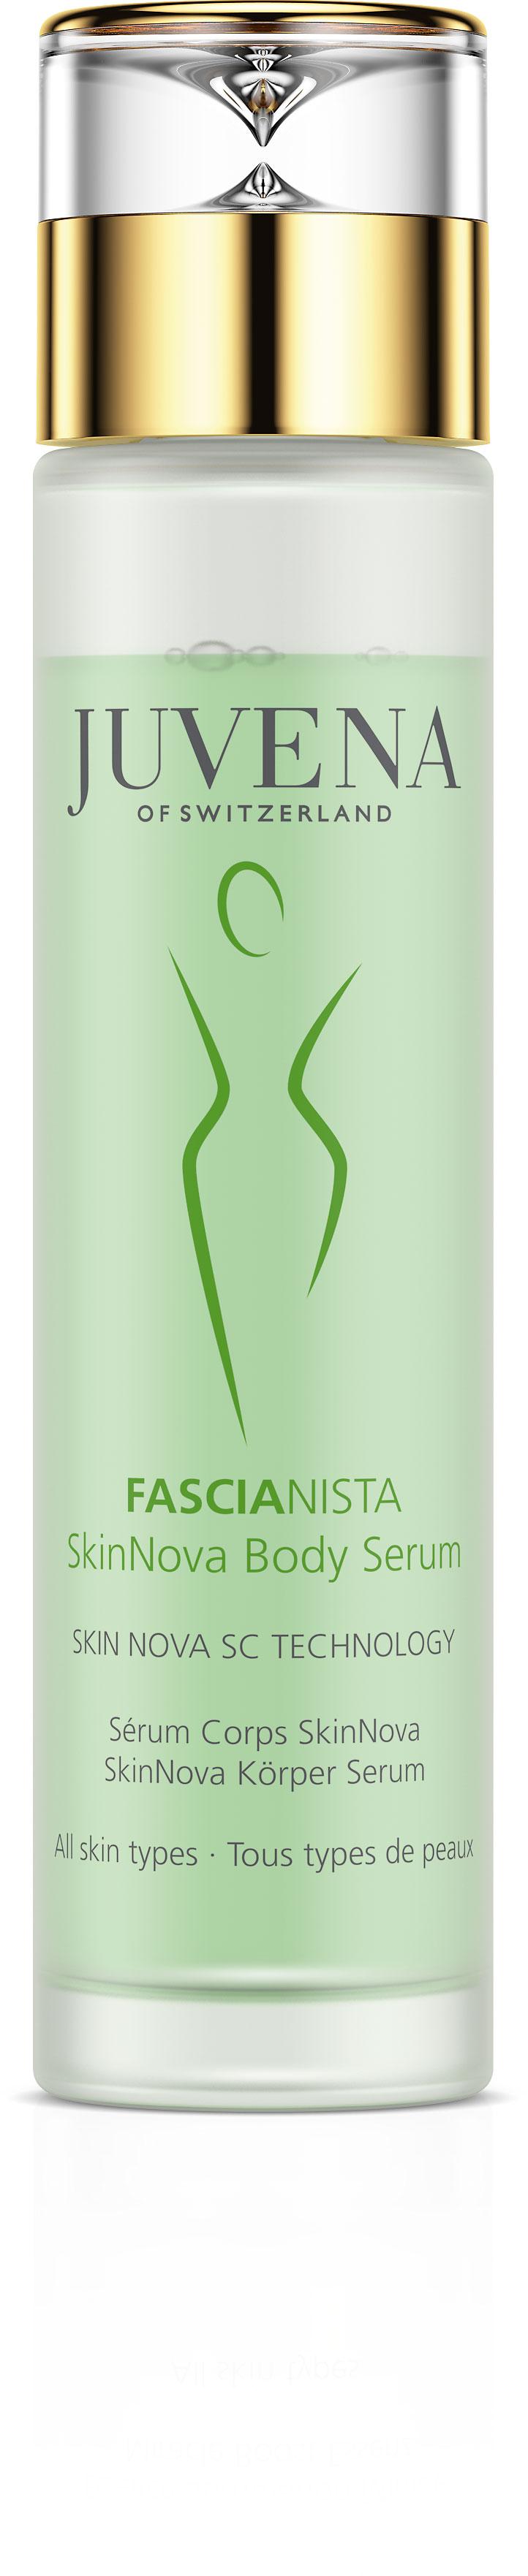 Juvena Fasciantista SkinNova Body Serum 125 ml